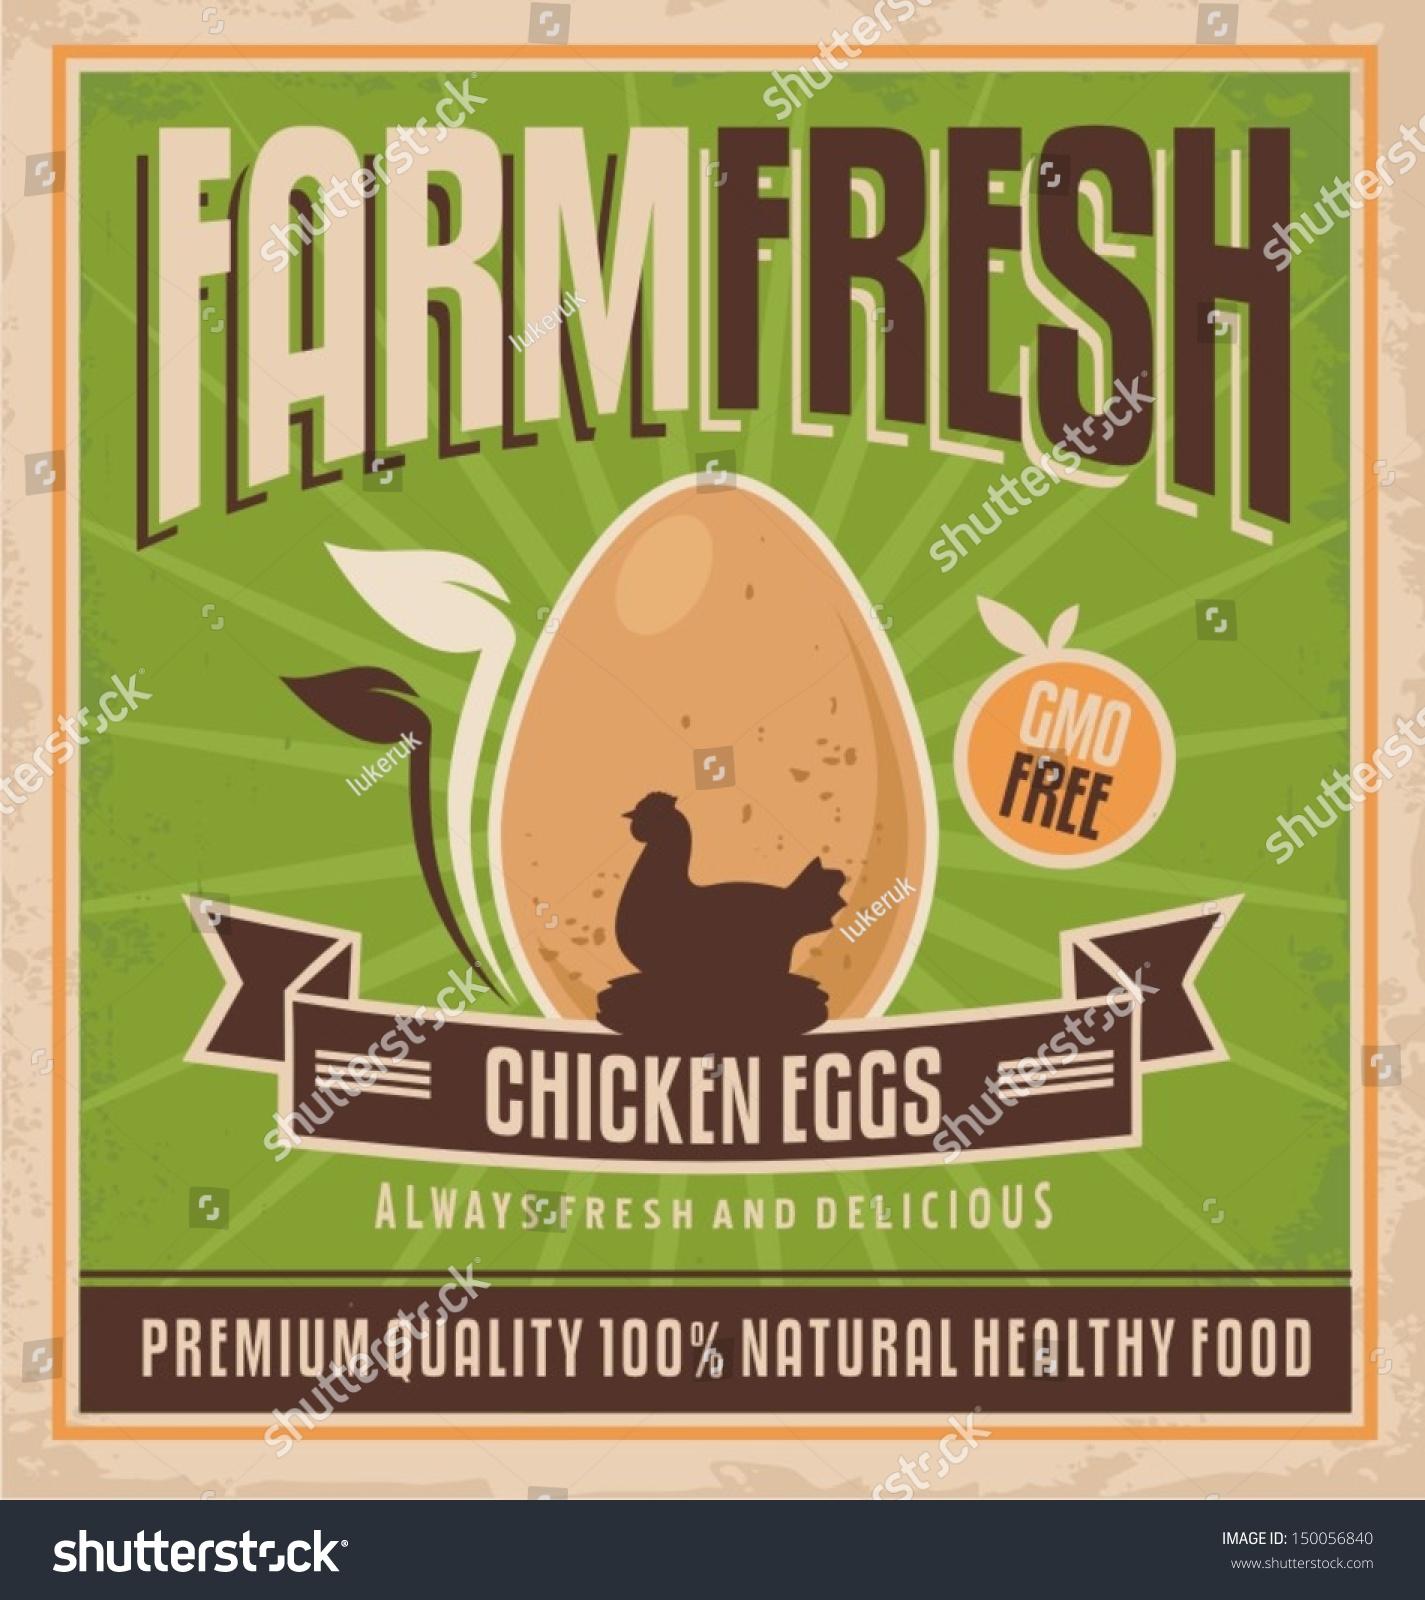 Farm Fresh Chicken Eggs Vintage Label Stock Vector